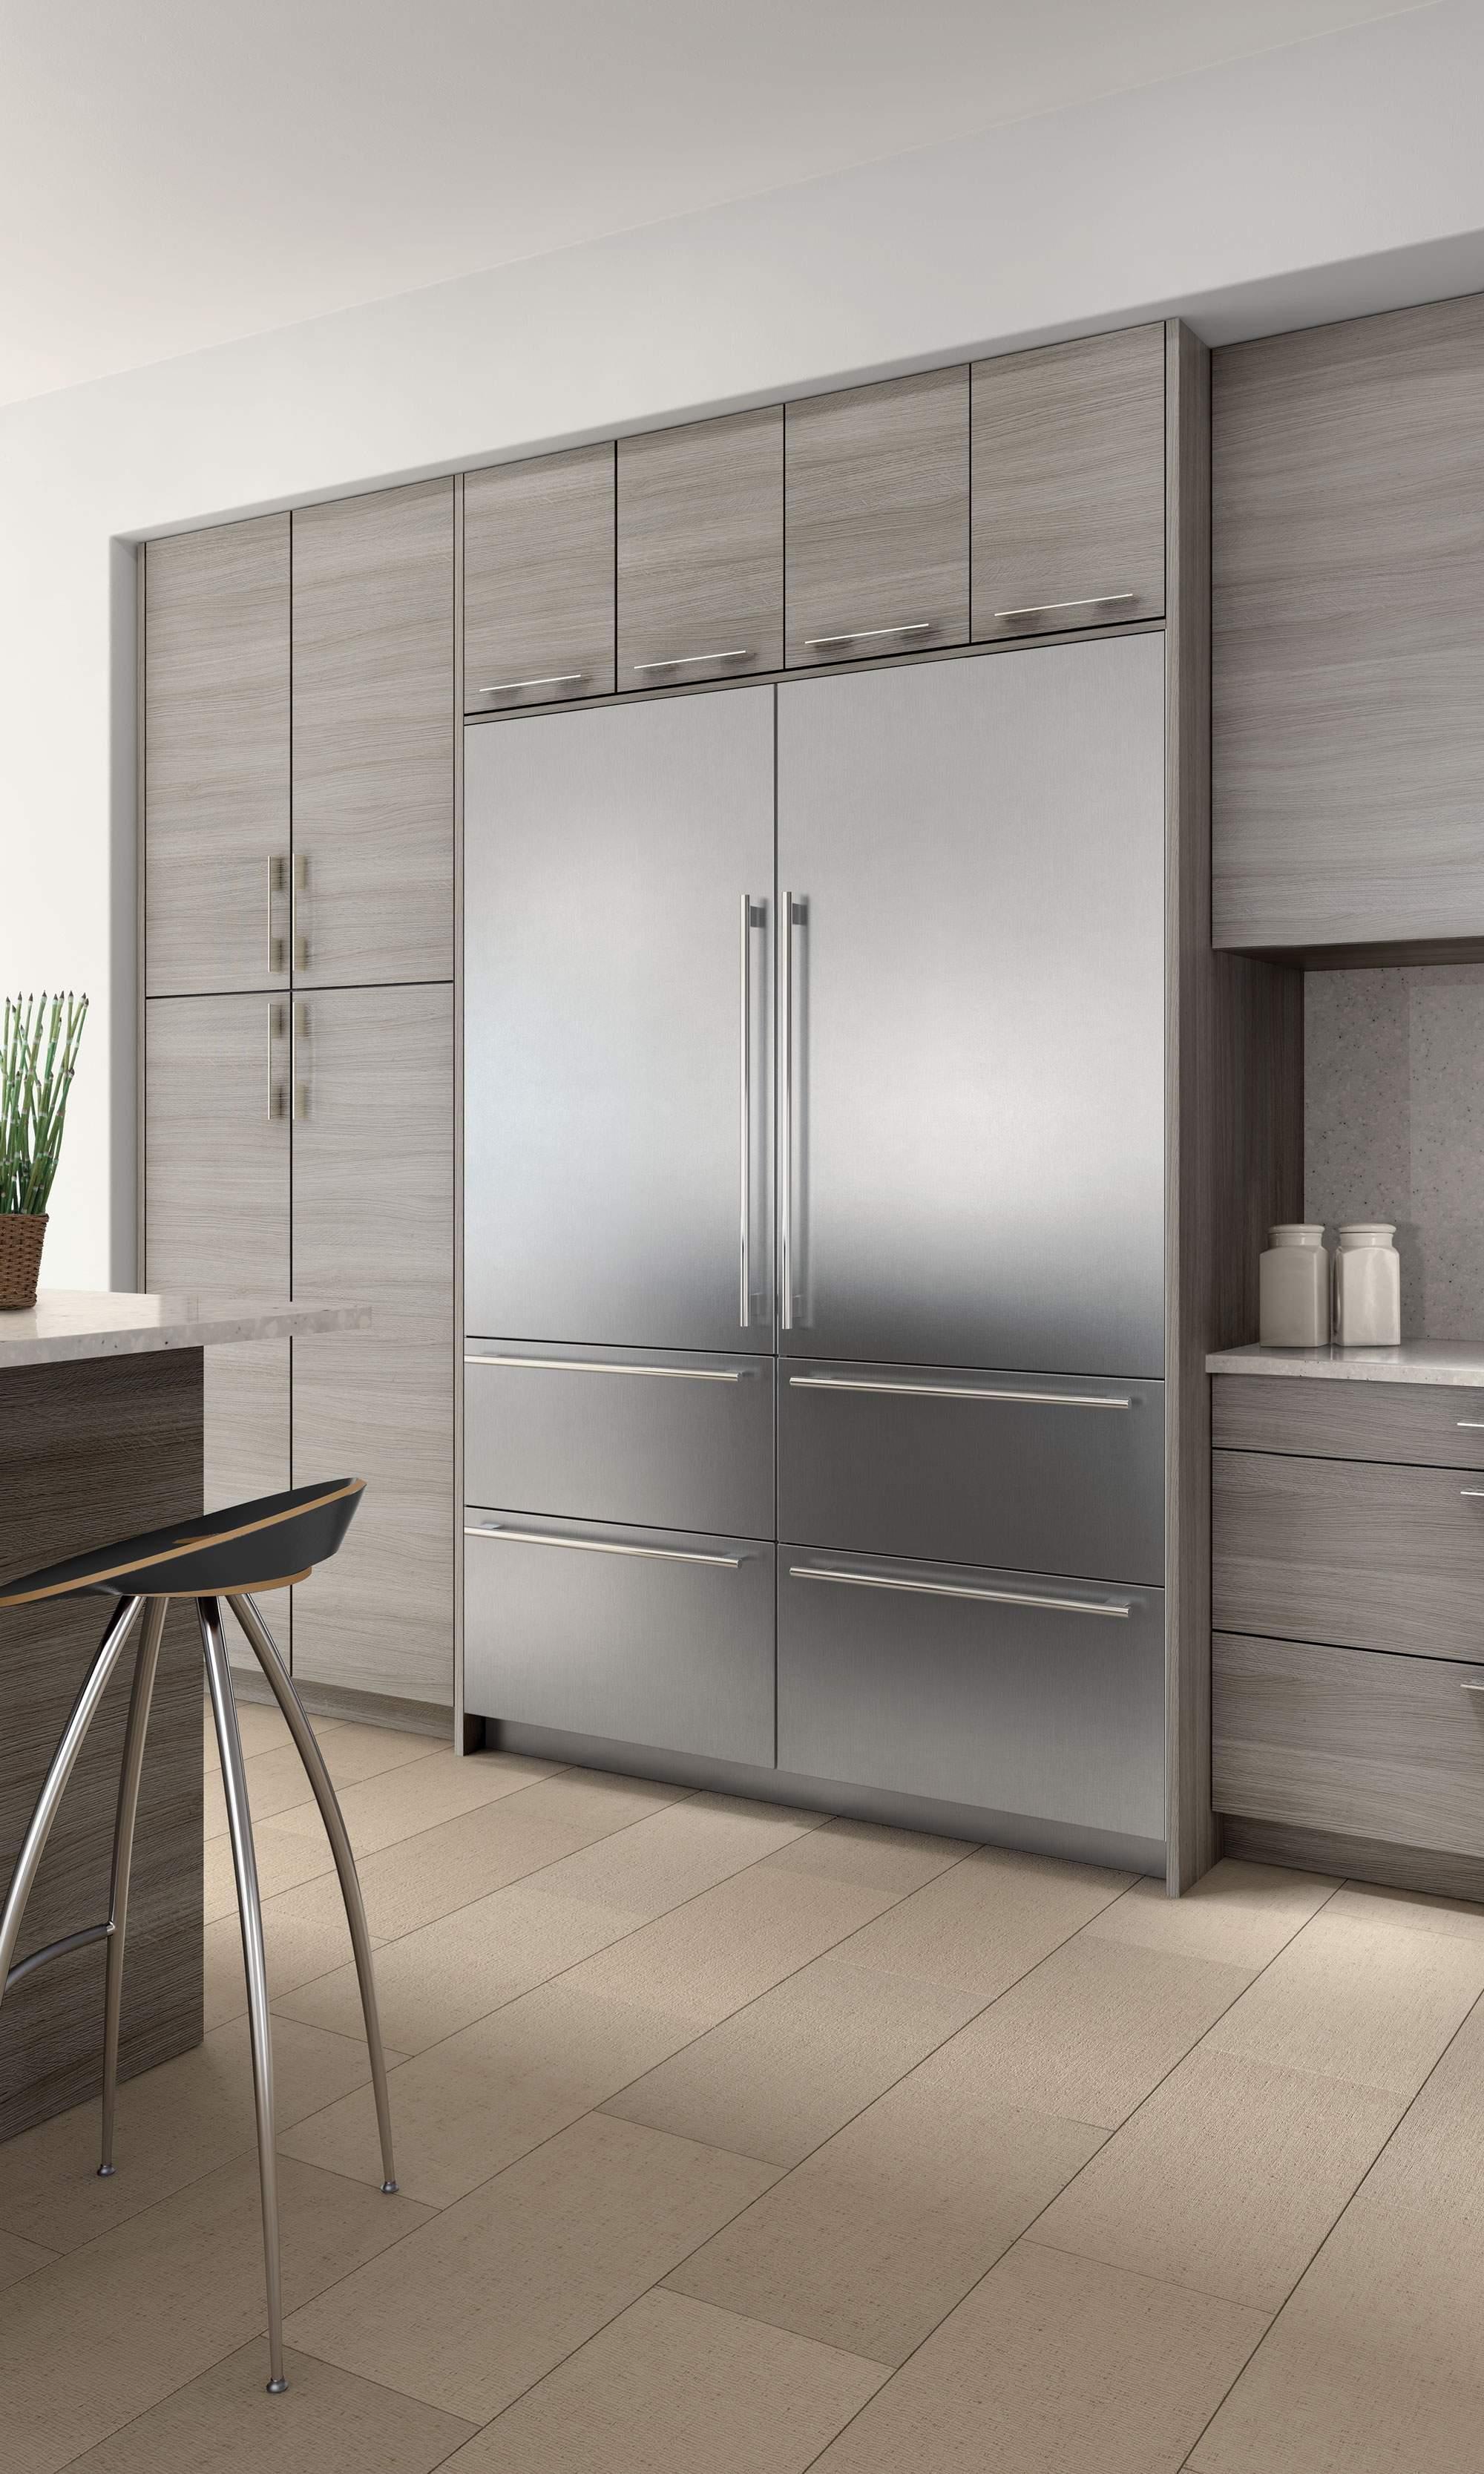 Sub Zero It30rlh 30 Inch Integrated All Refrigerator With